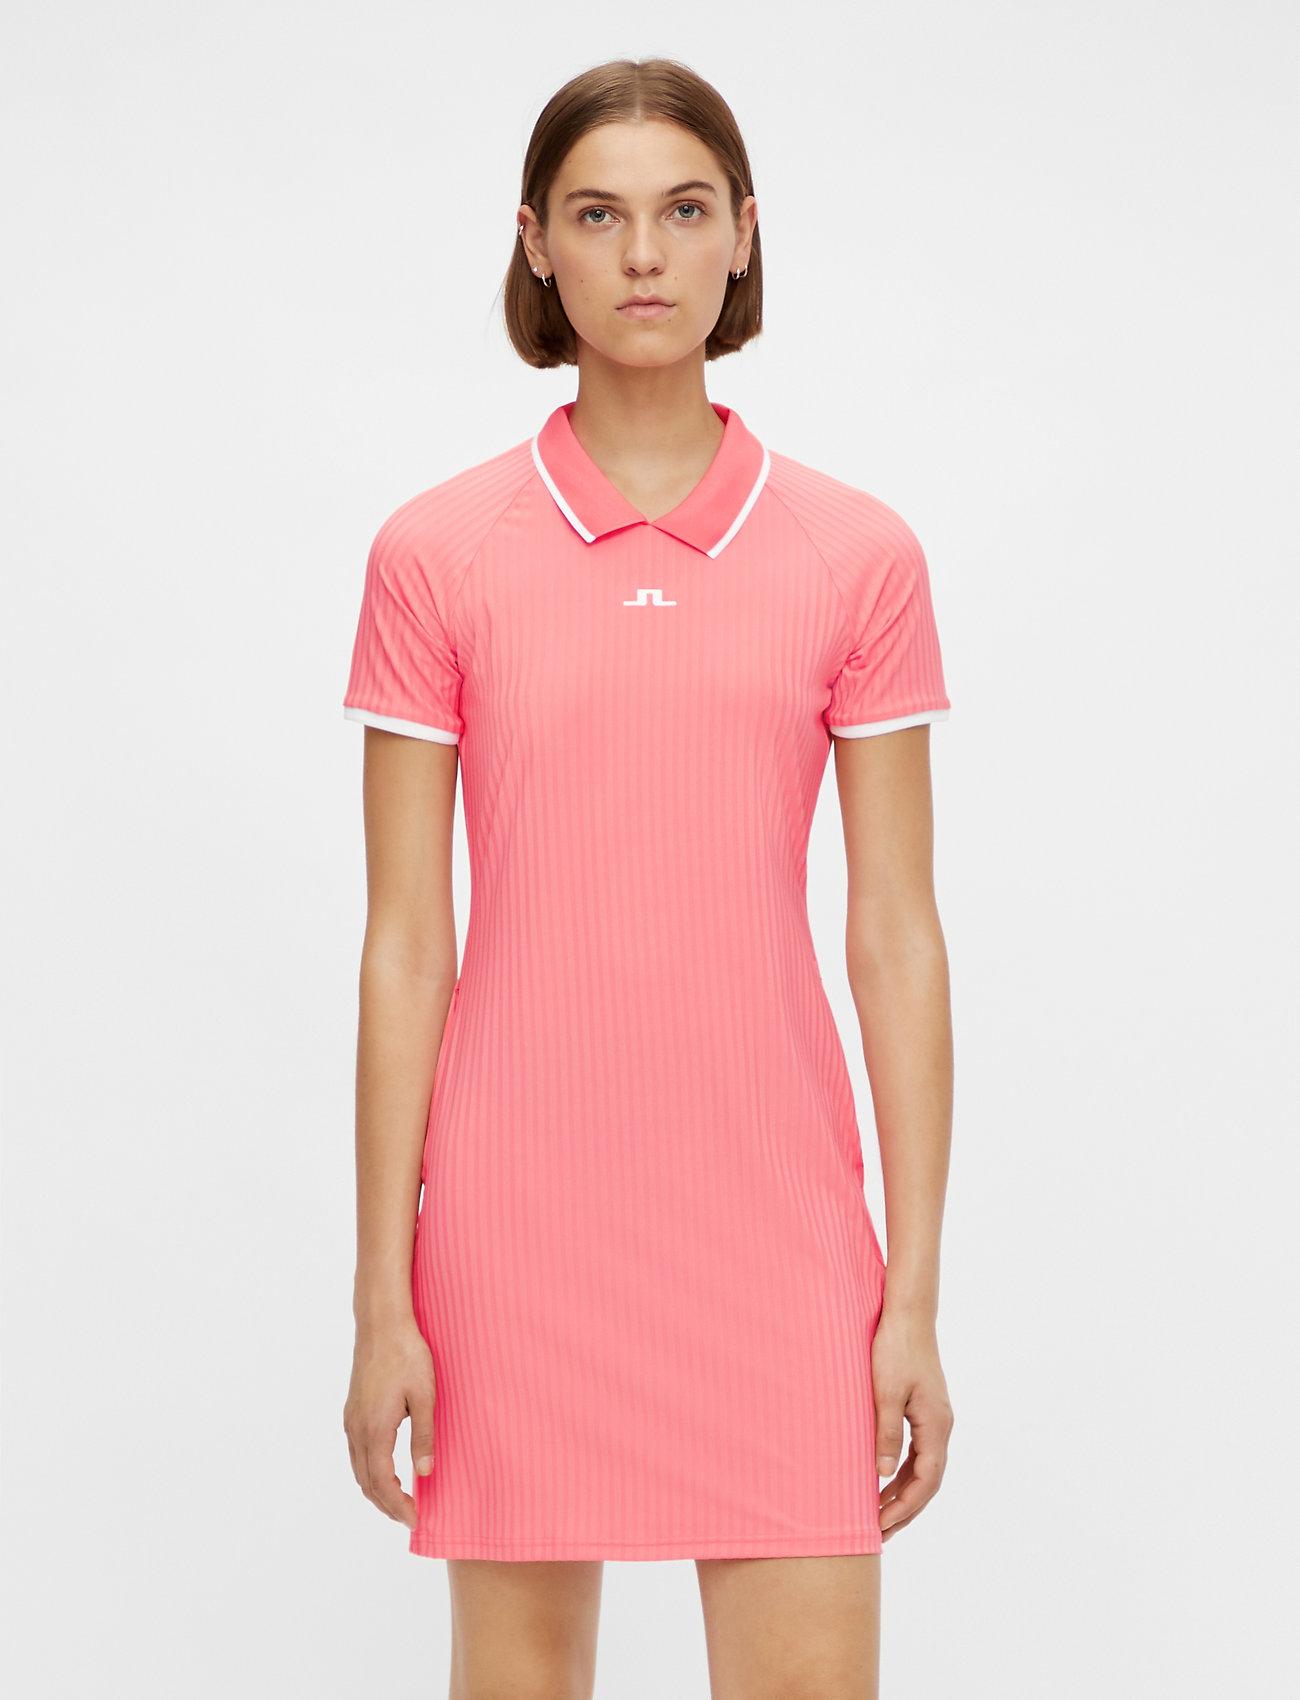 J. Lindeberg Golf - April Golf Dress - t-shirt dresses - tropical coral - 0